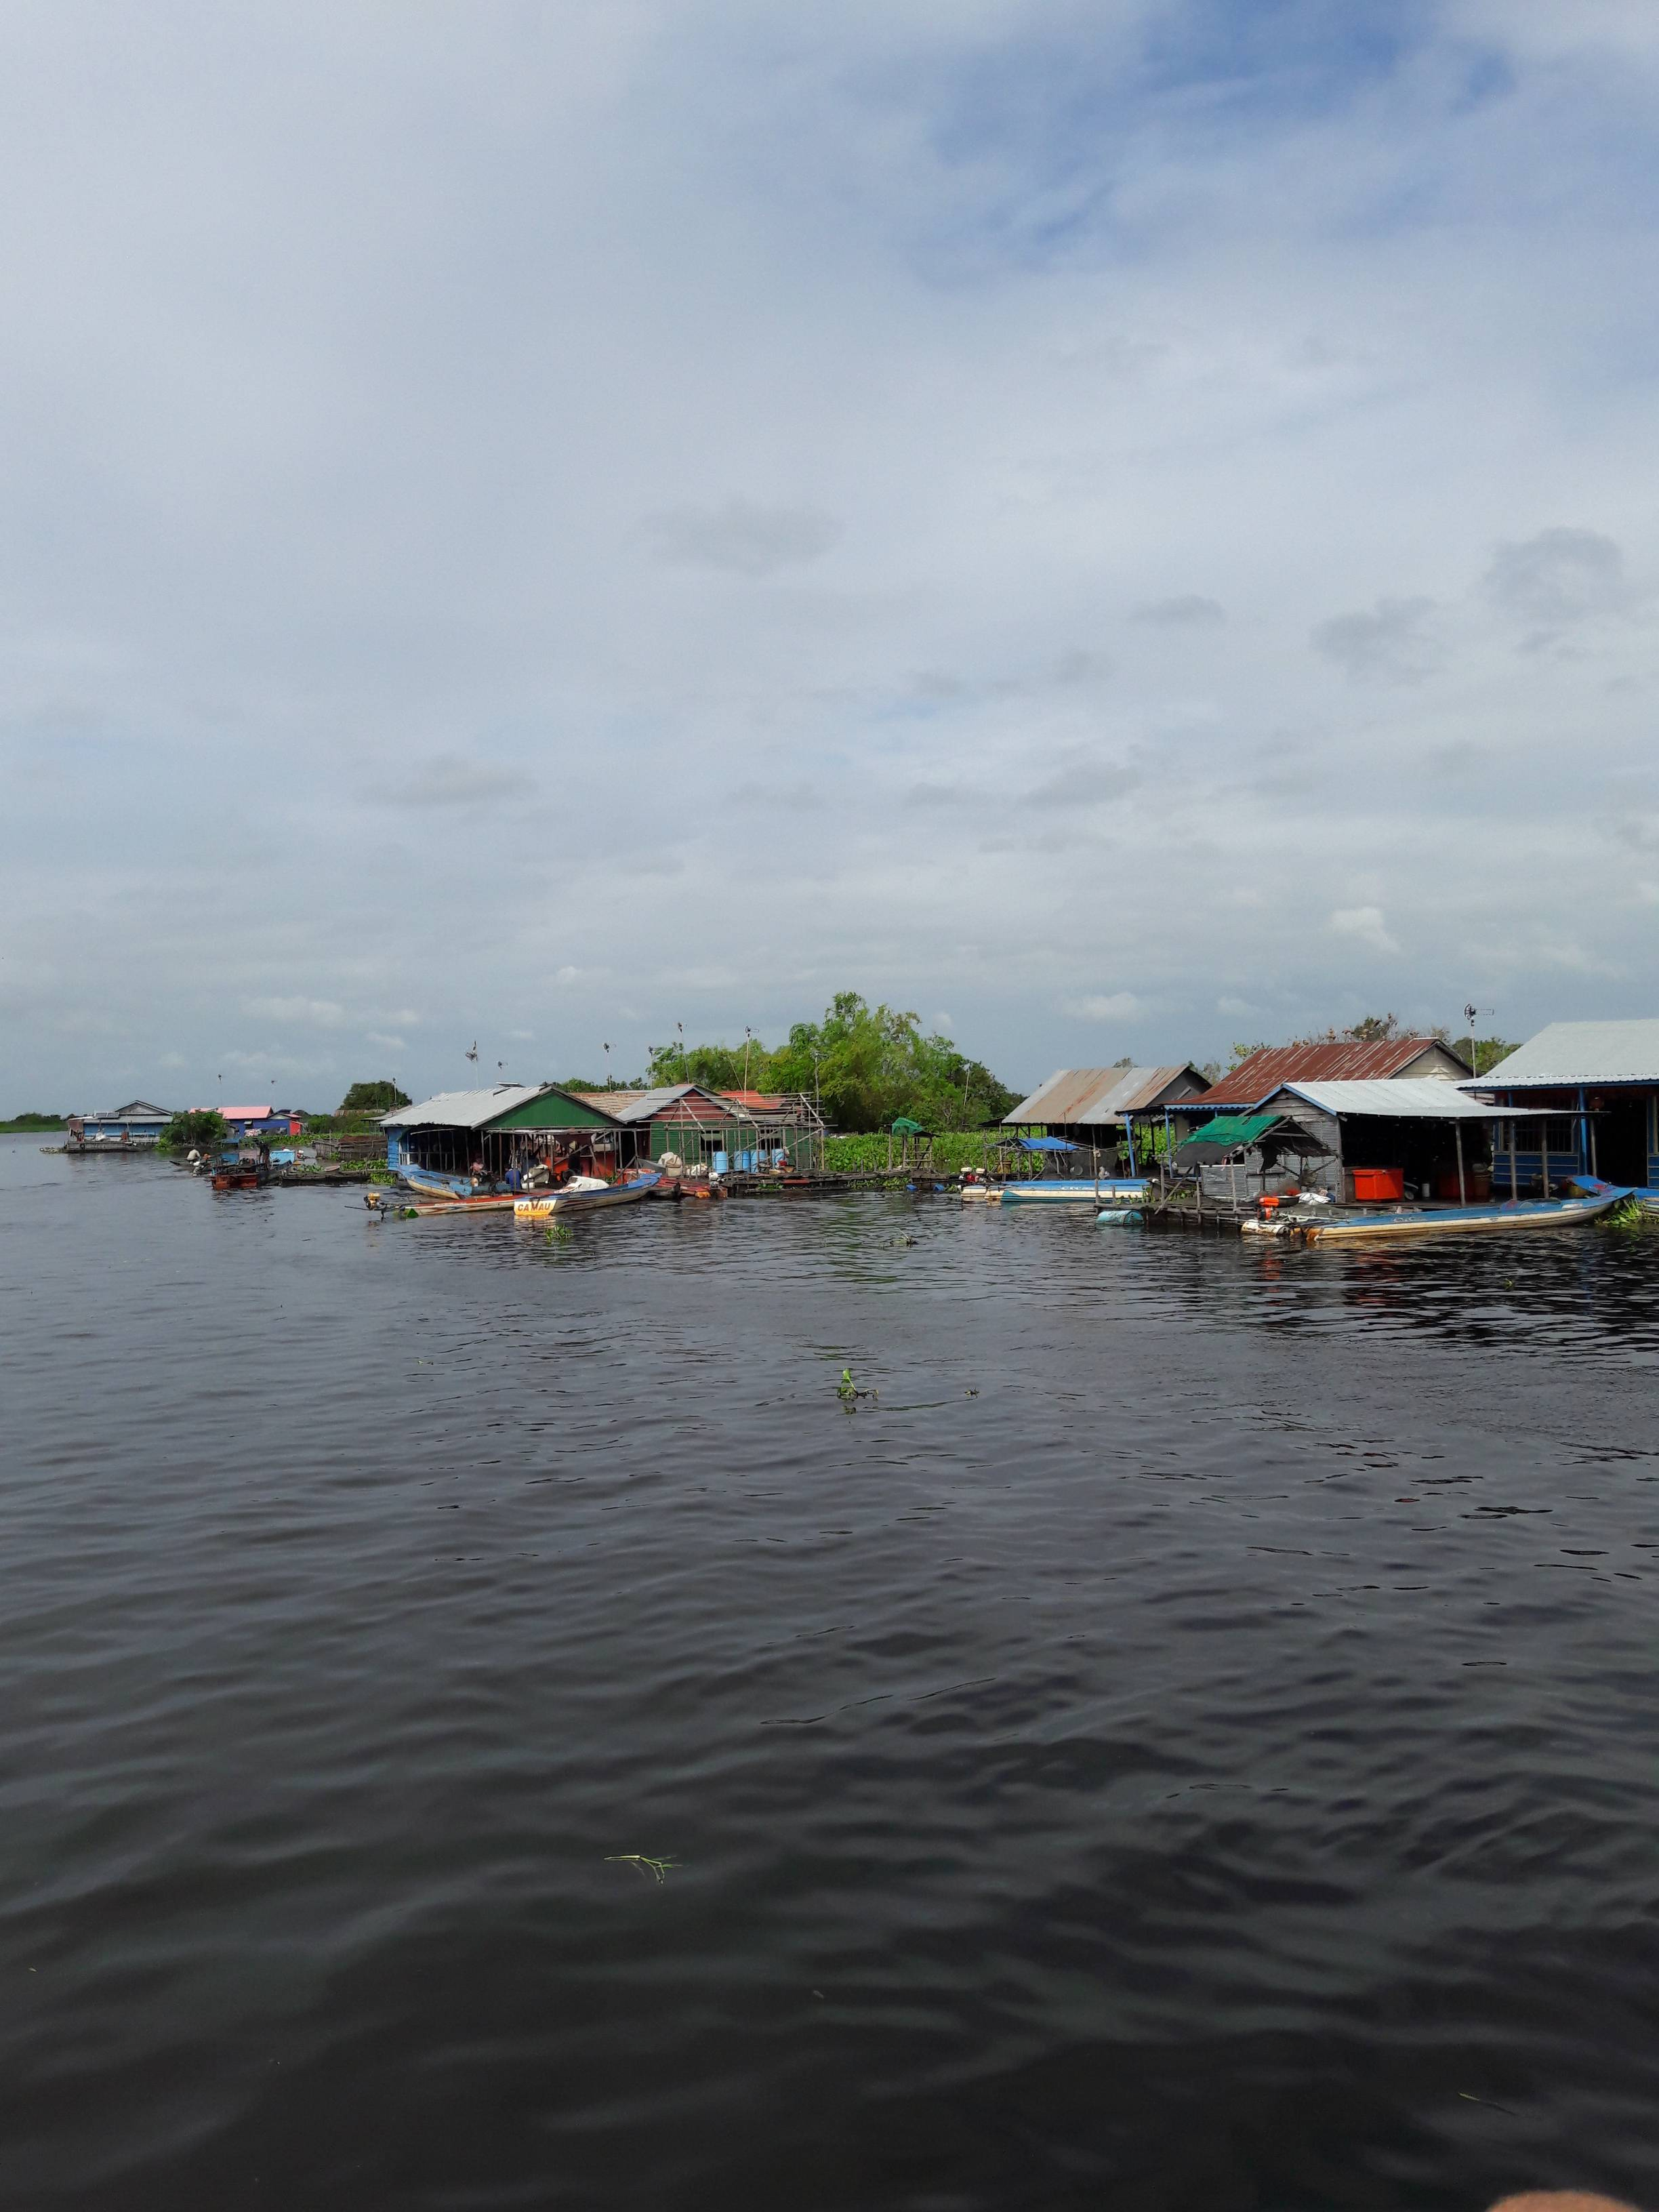 Photo 1: De Siem Reap à Battambang en bateau